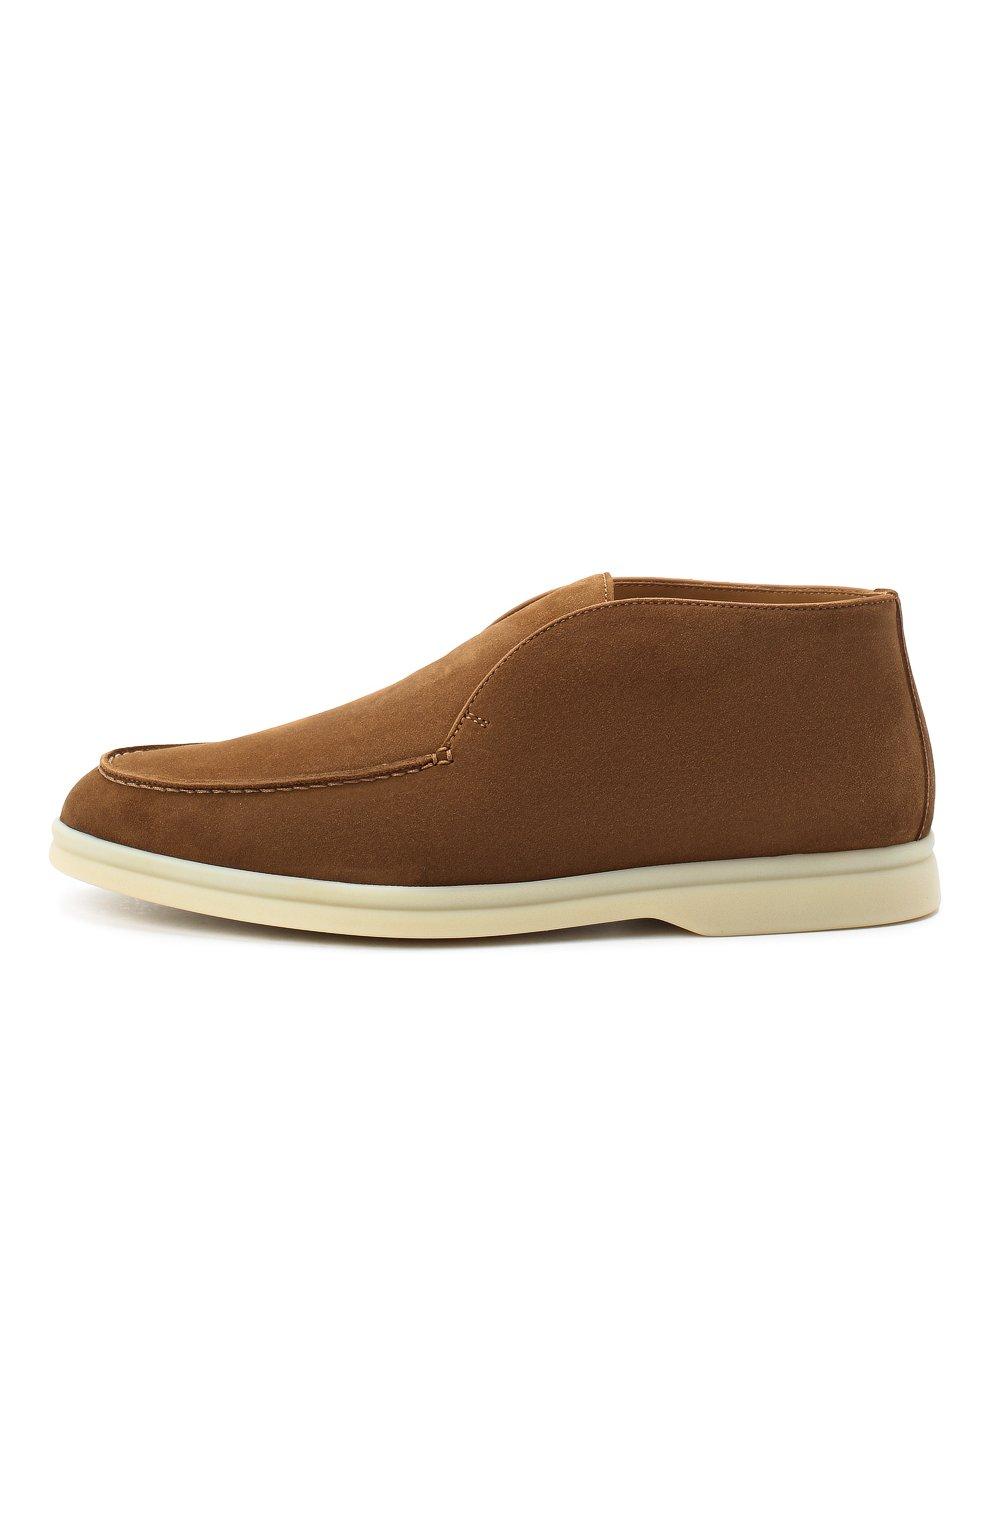 Женские замшевые ботинки open walk LORO PIANA коричневого цвета, арт. FAE9959 | Фото 3